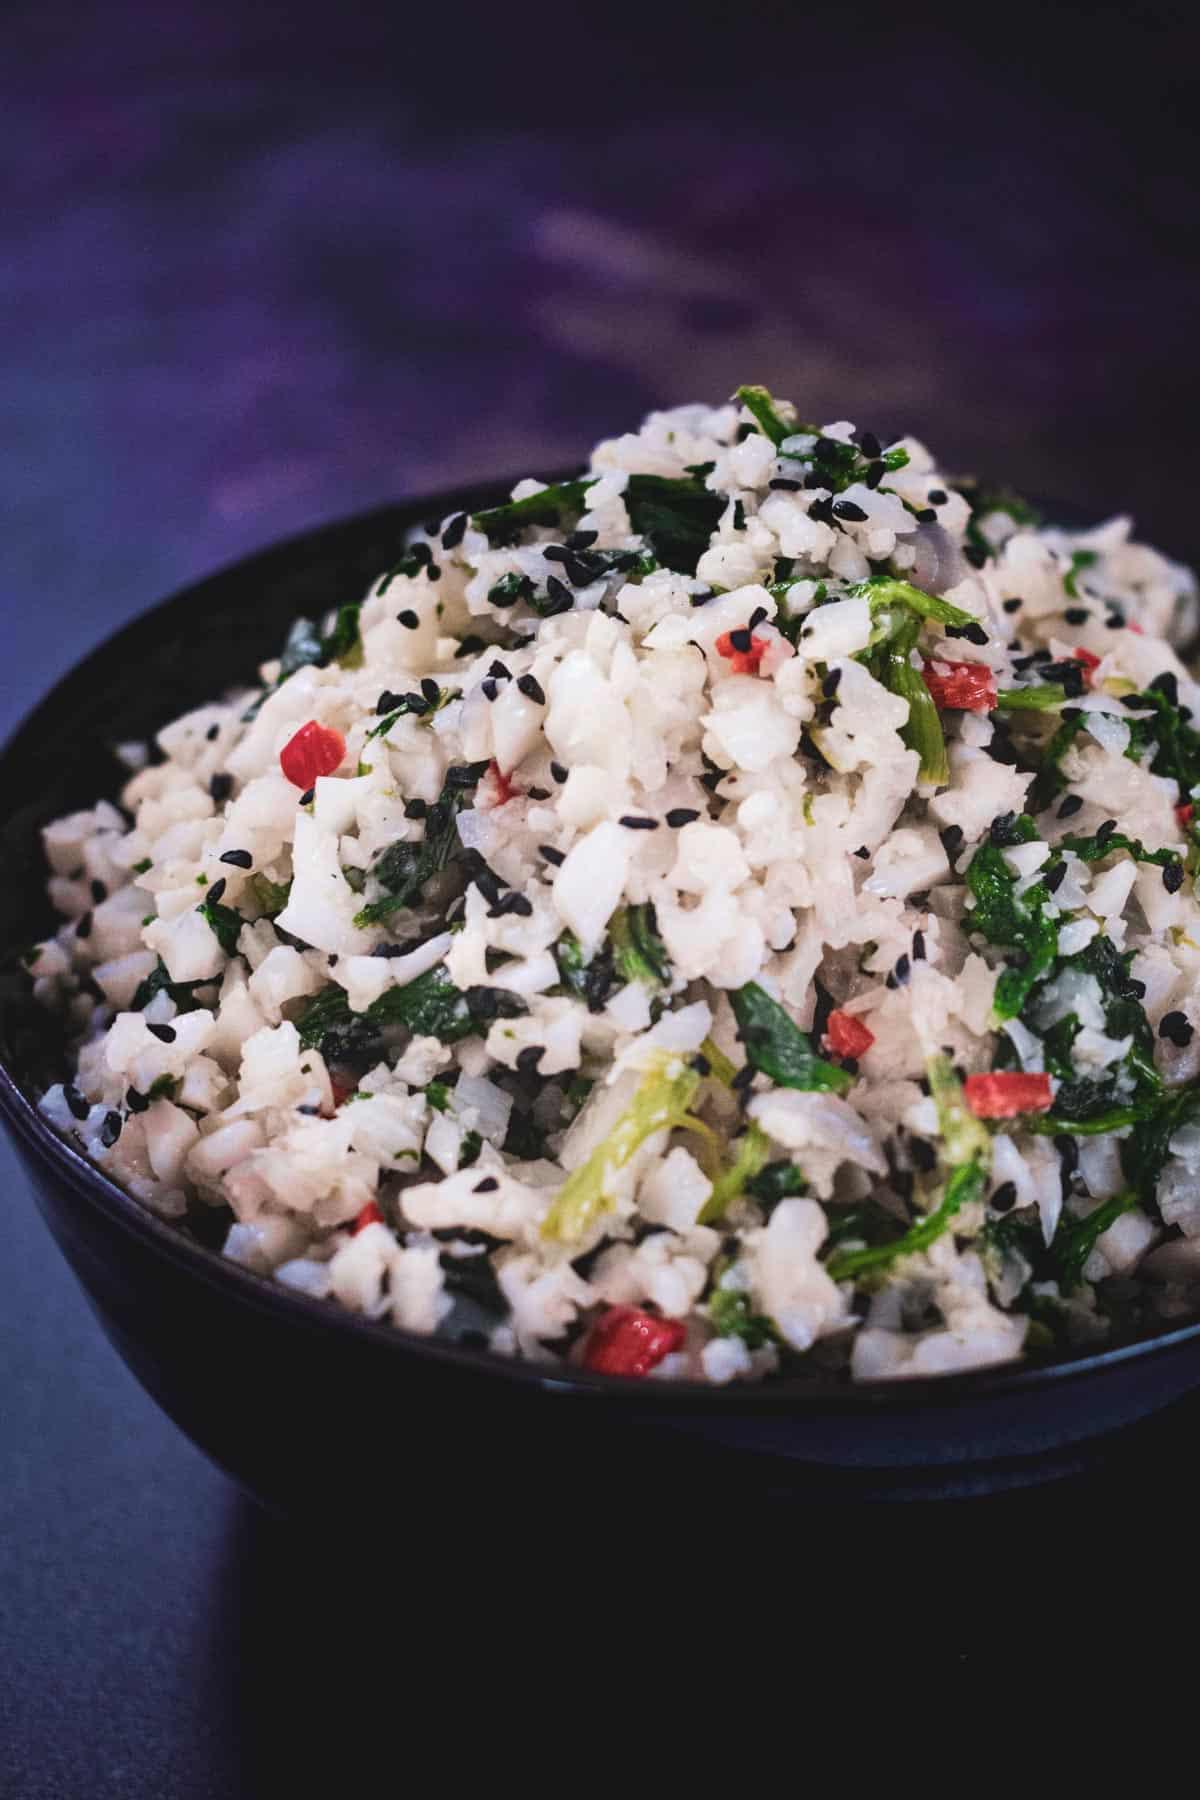 Cauliflower rice in black bowl